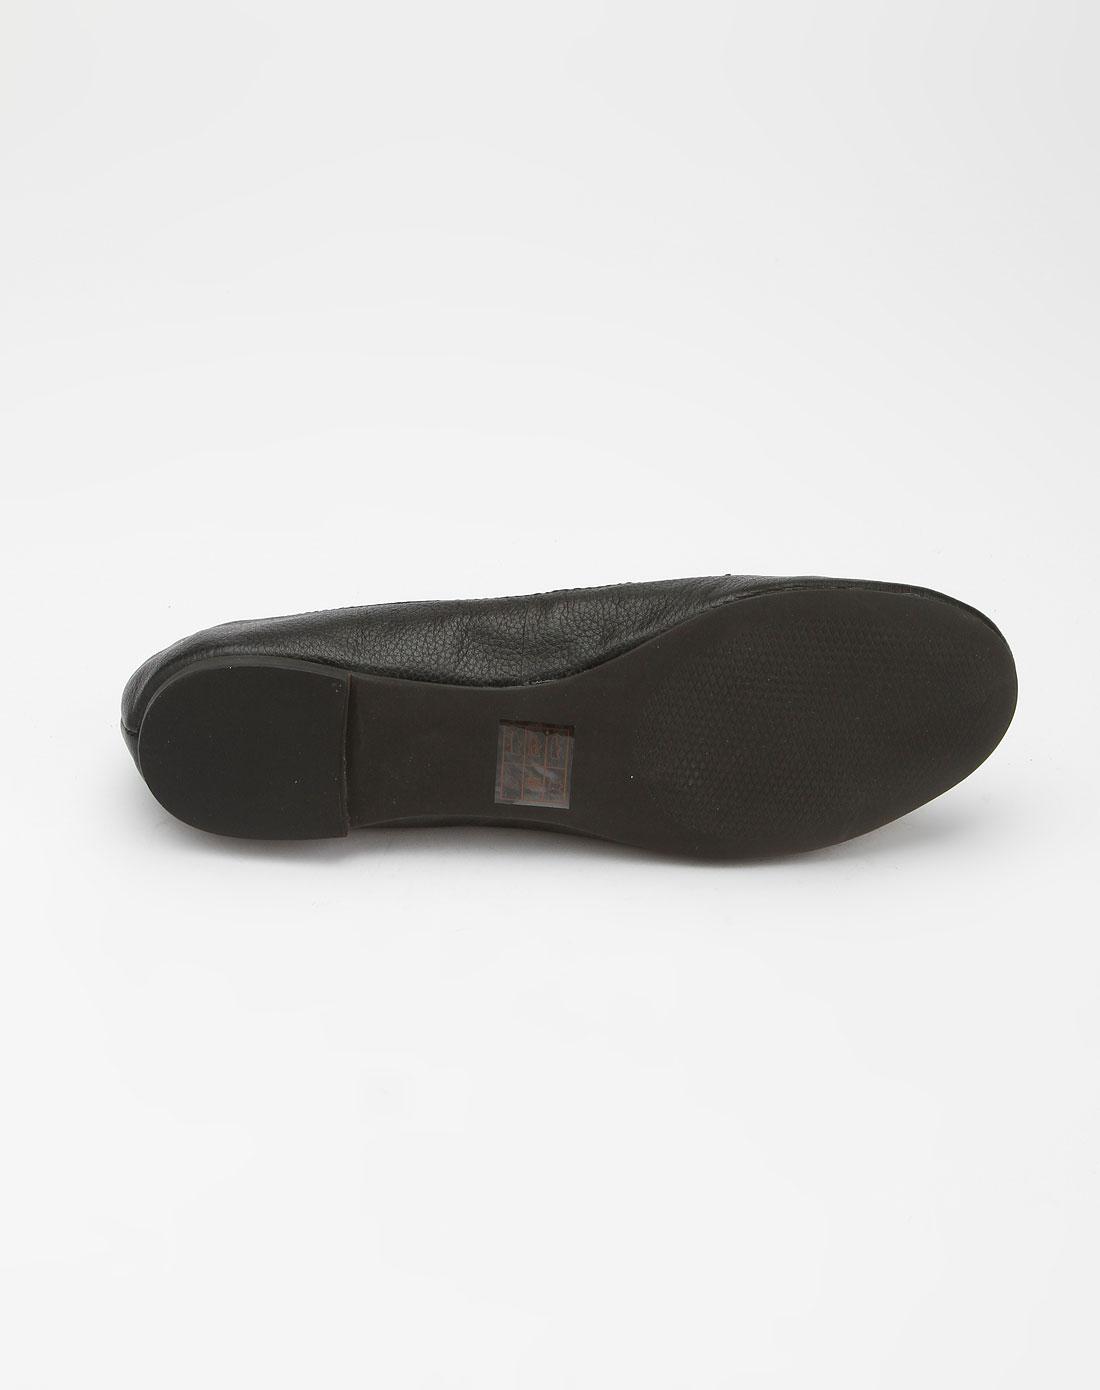 steve madden黑色时尚铆钉单鞋